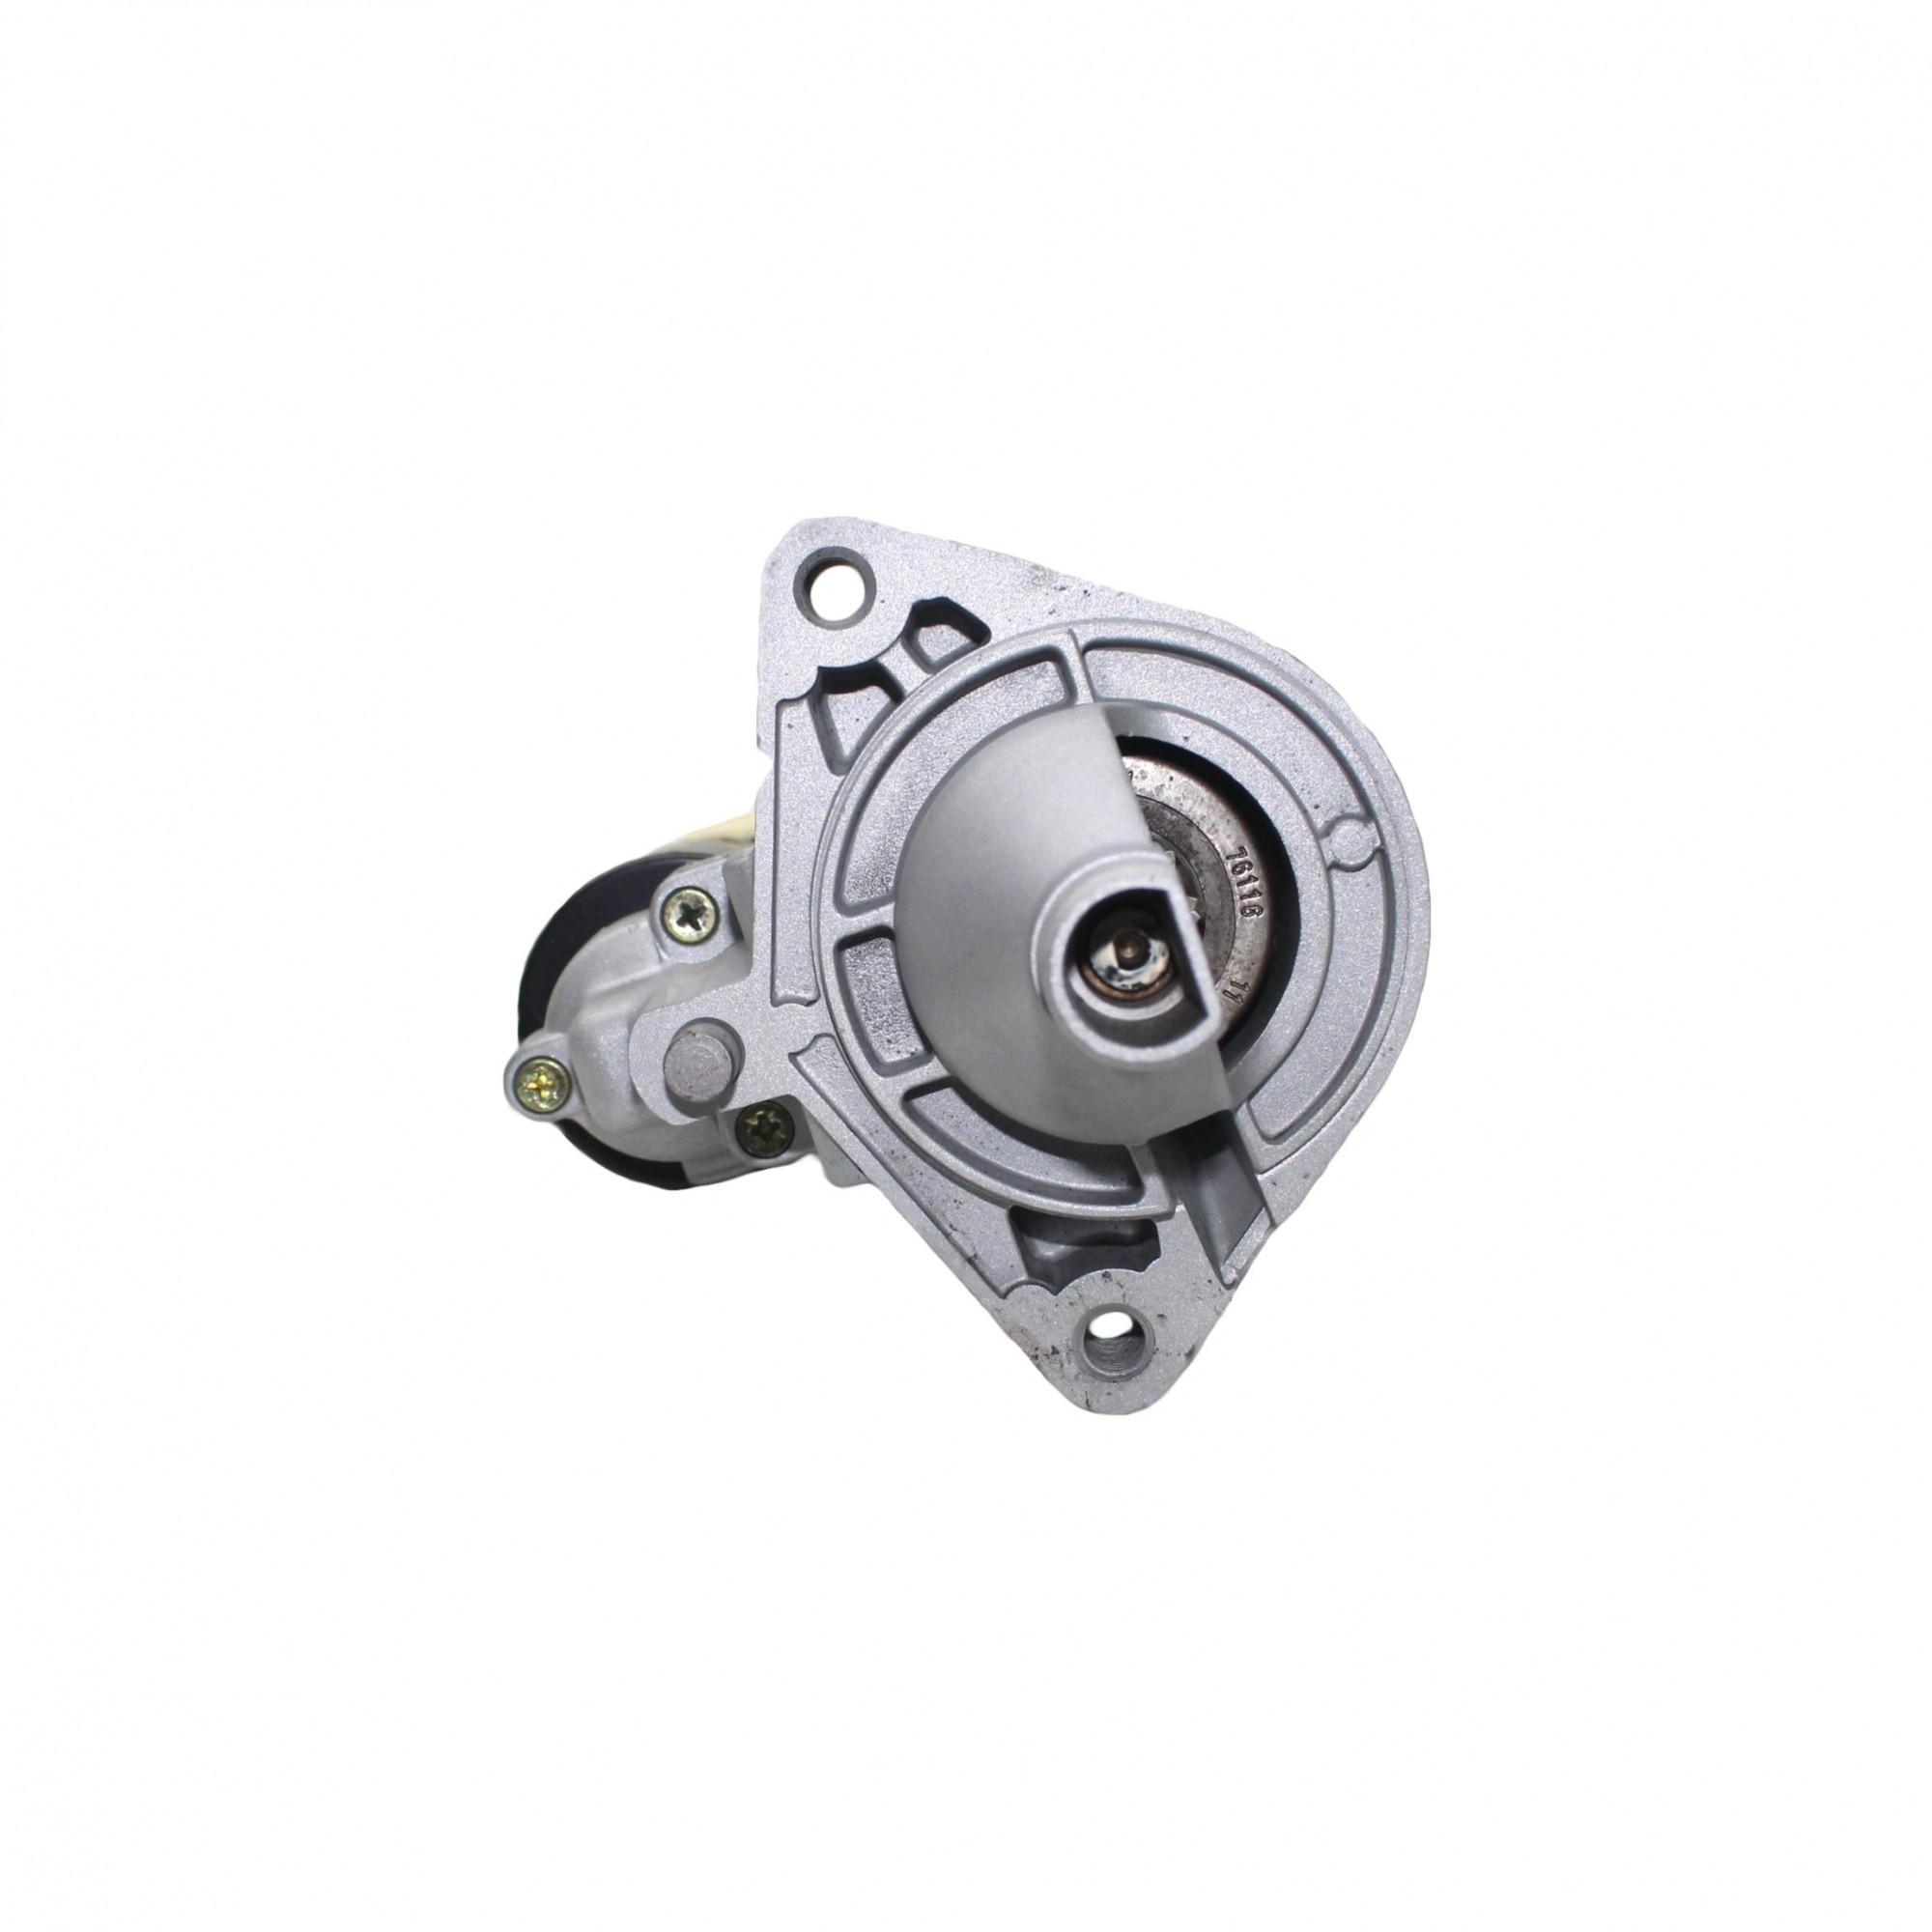 Motor de Arranque Partida Bosch Chrysler Grand Caravan V6 3.3 3.8 95...01 4686109